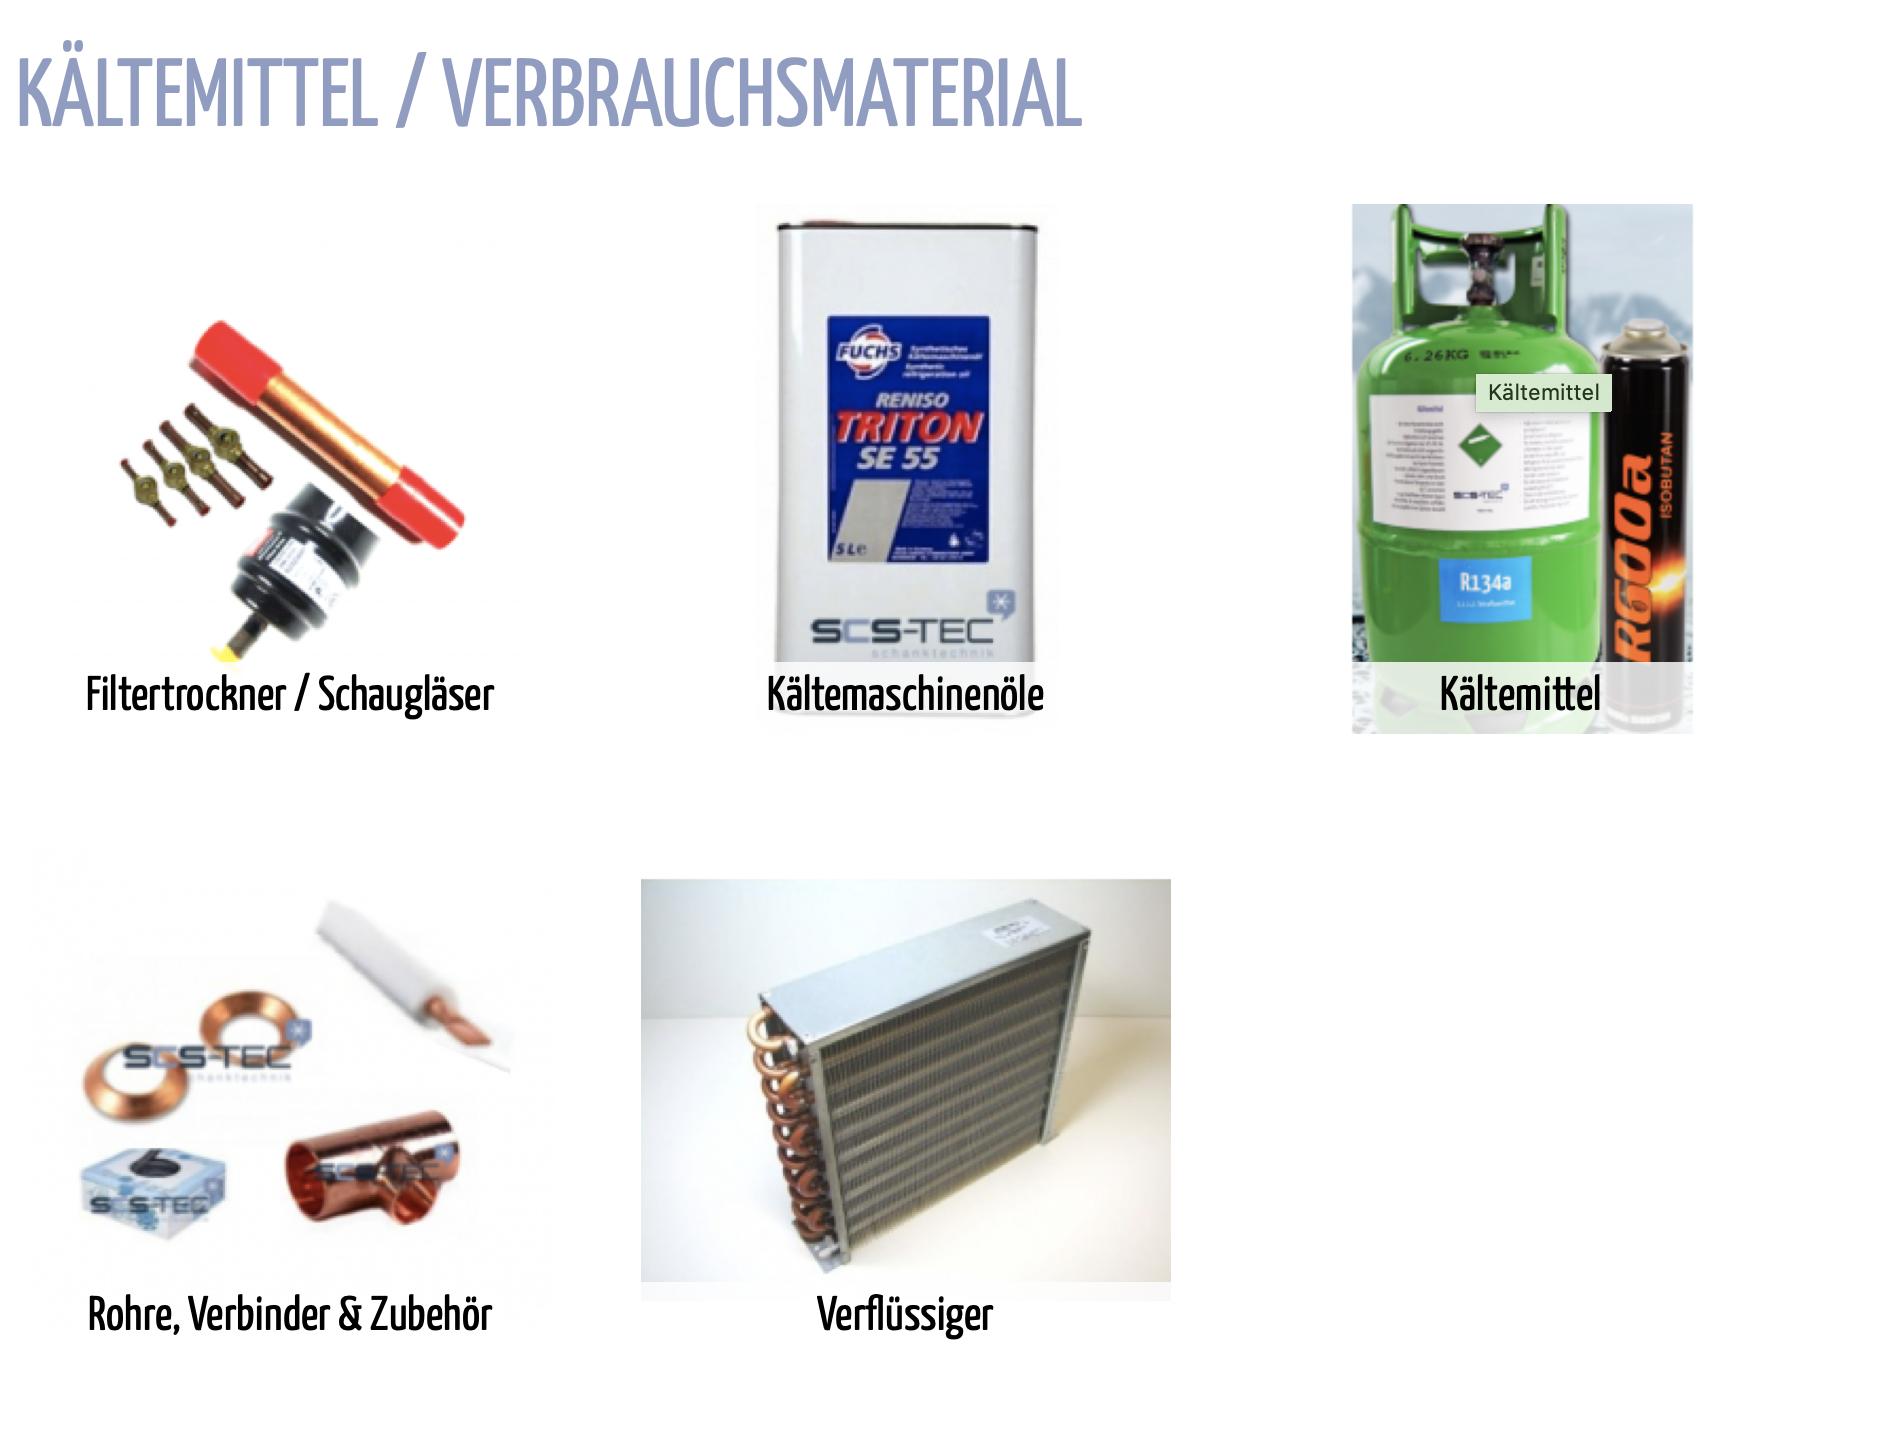 Kältemittel / Verbrauchsmaterial